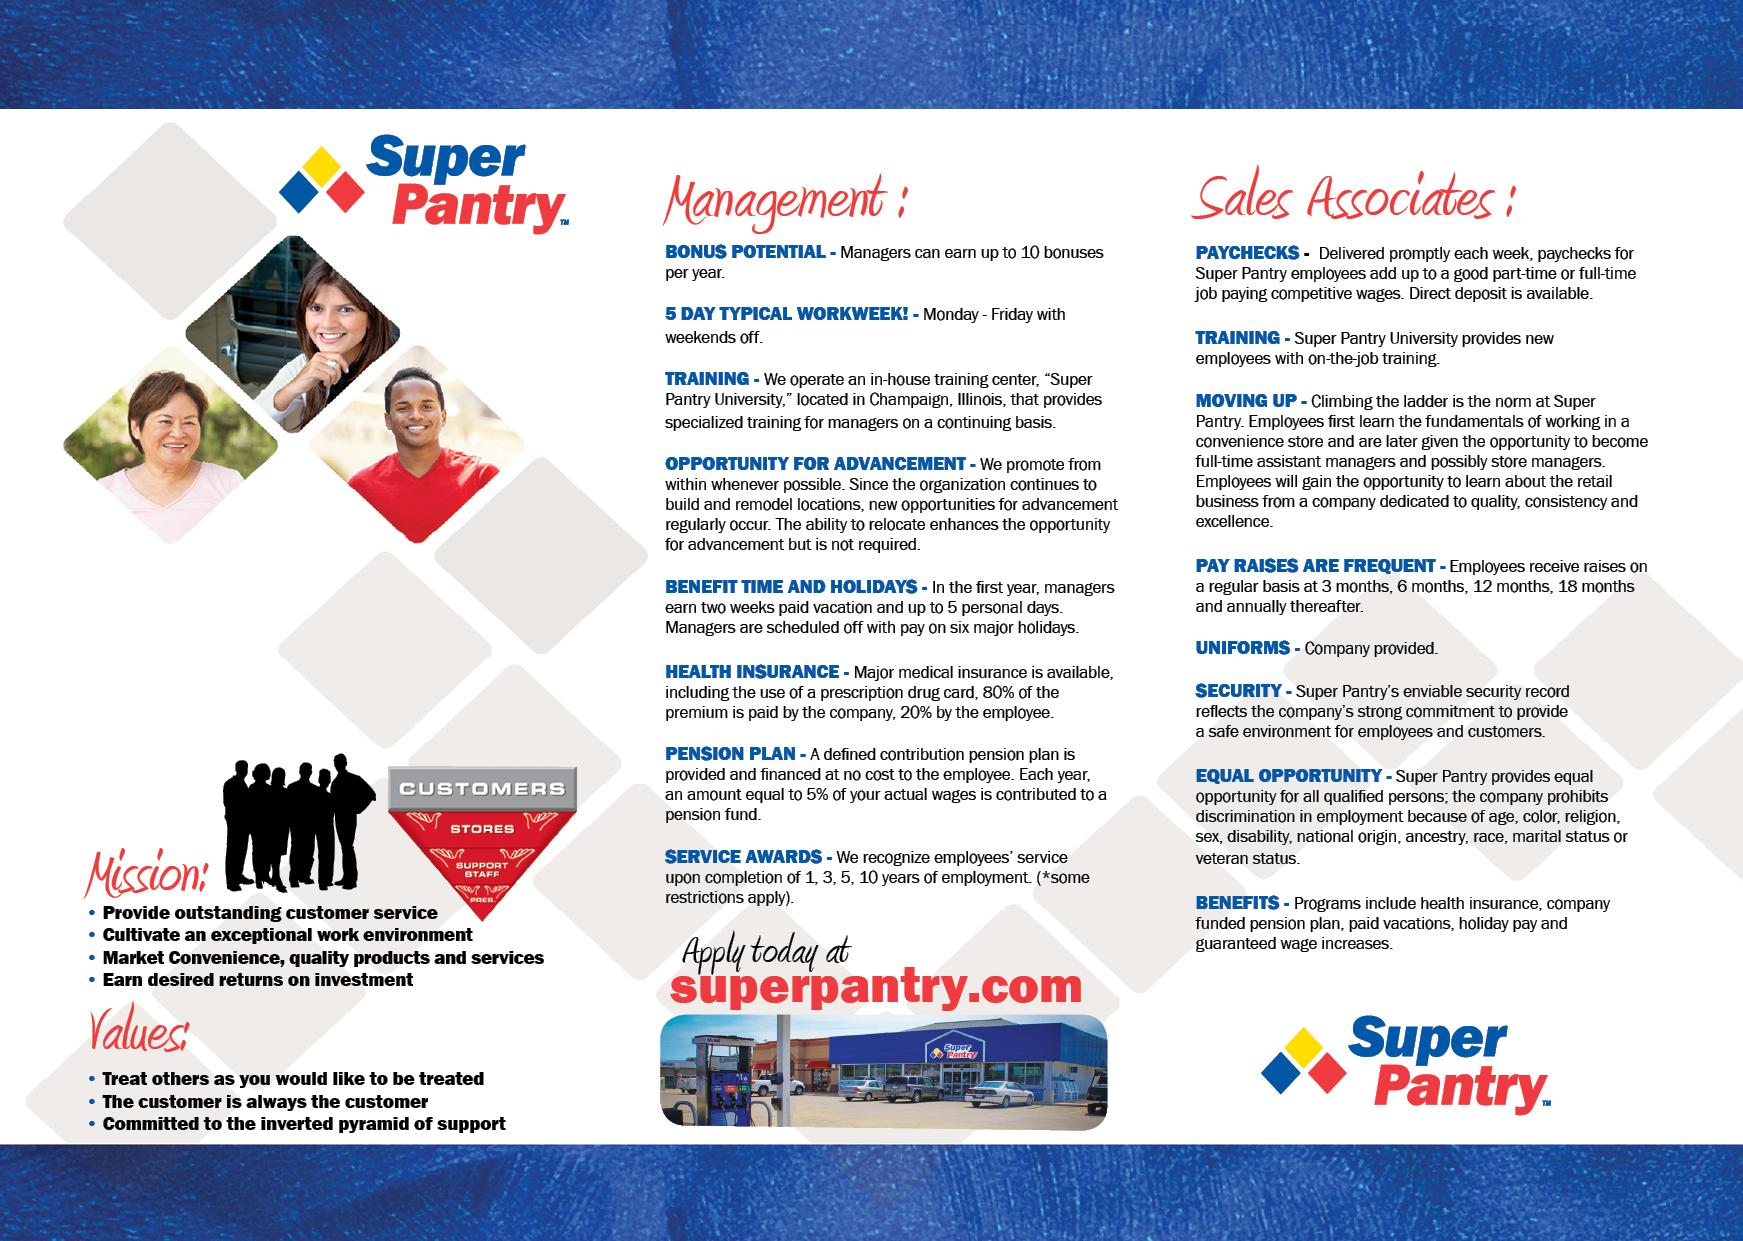 Employee Recruitment Tri Fold Brochure (Inside)